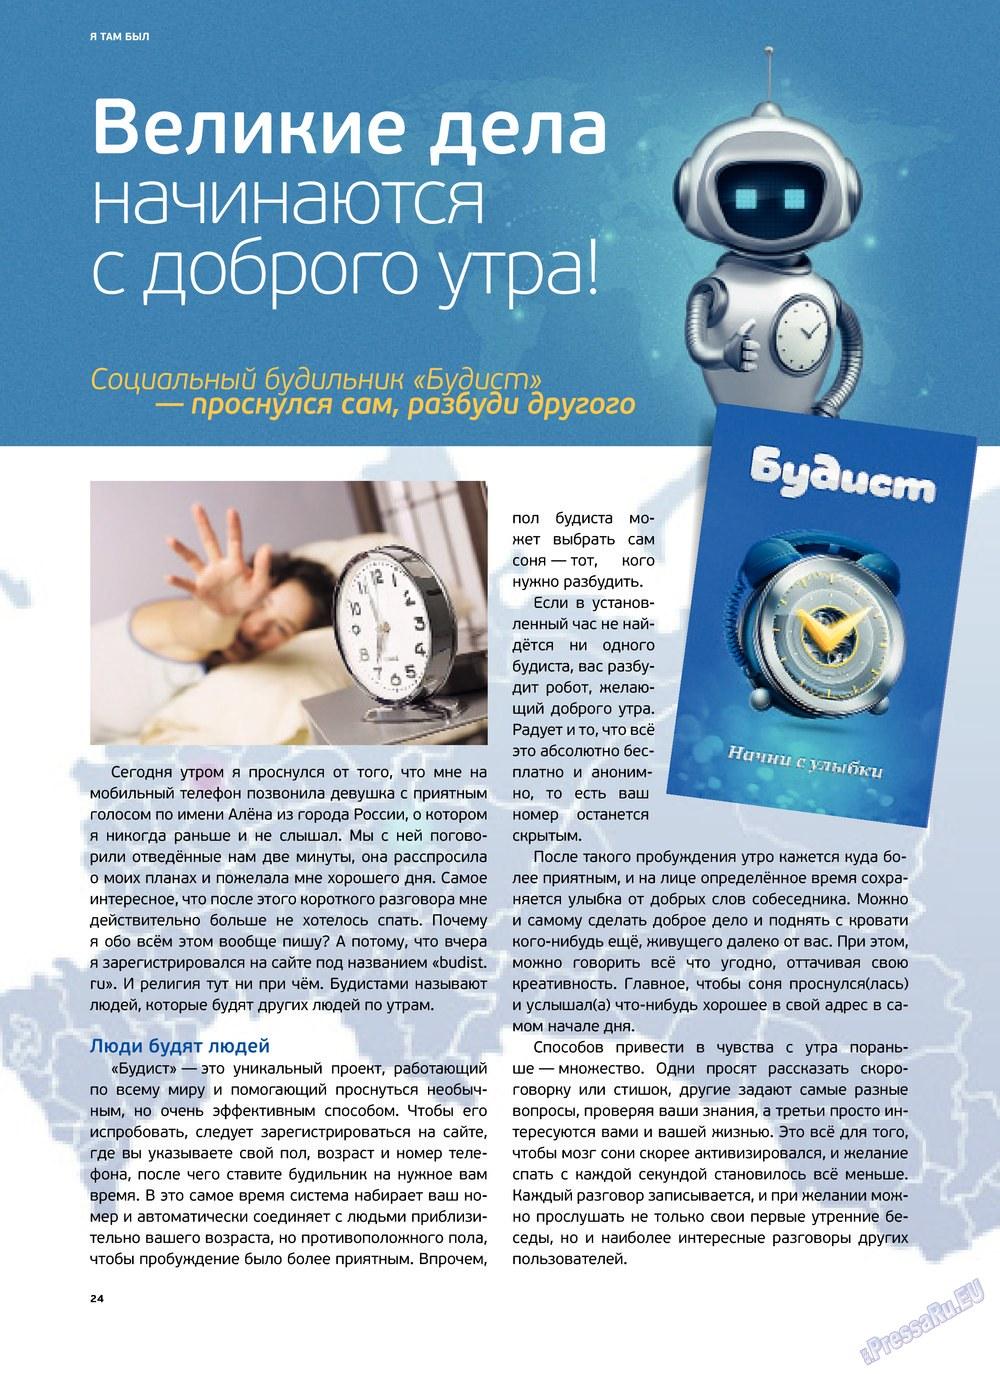 Артек (журнал). 2013 год, номер 1, стр. 26